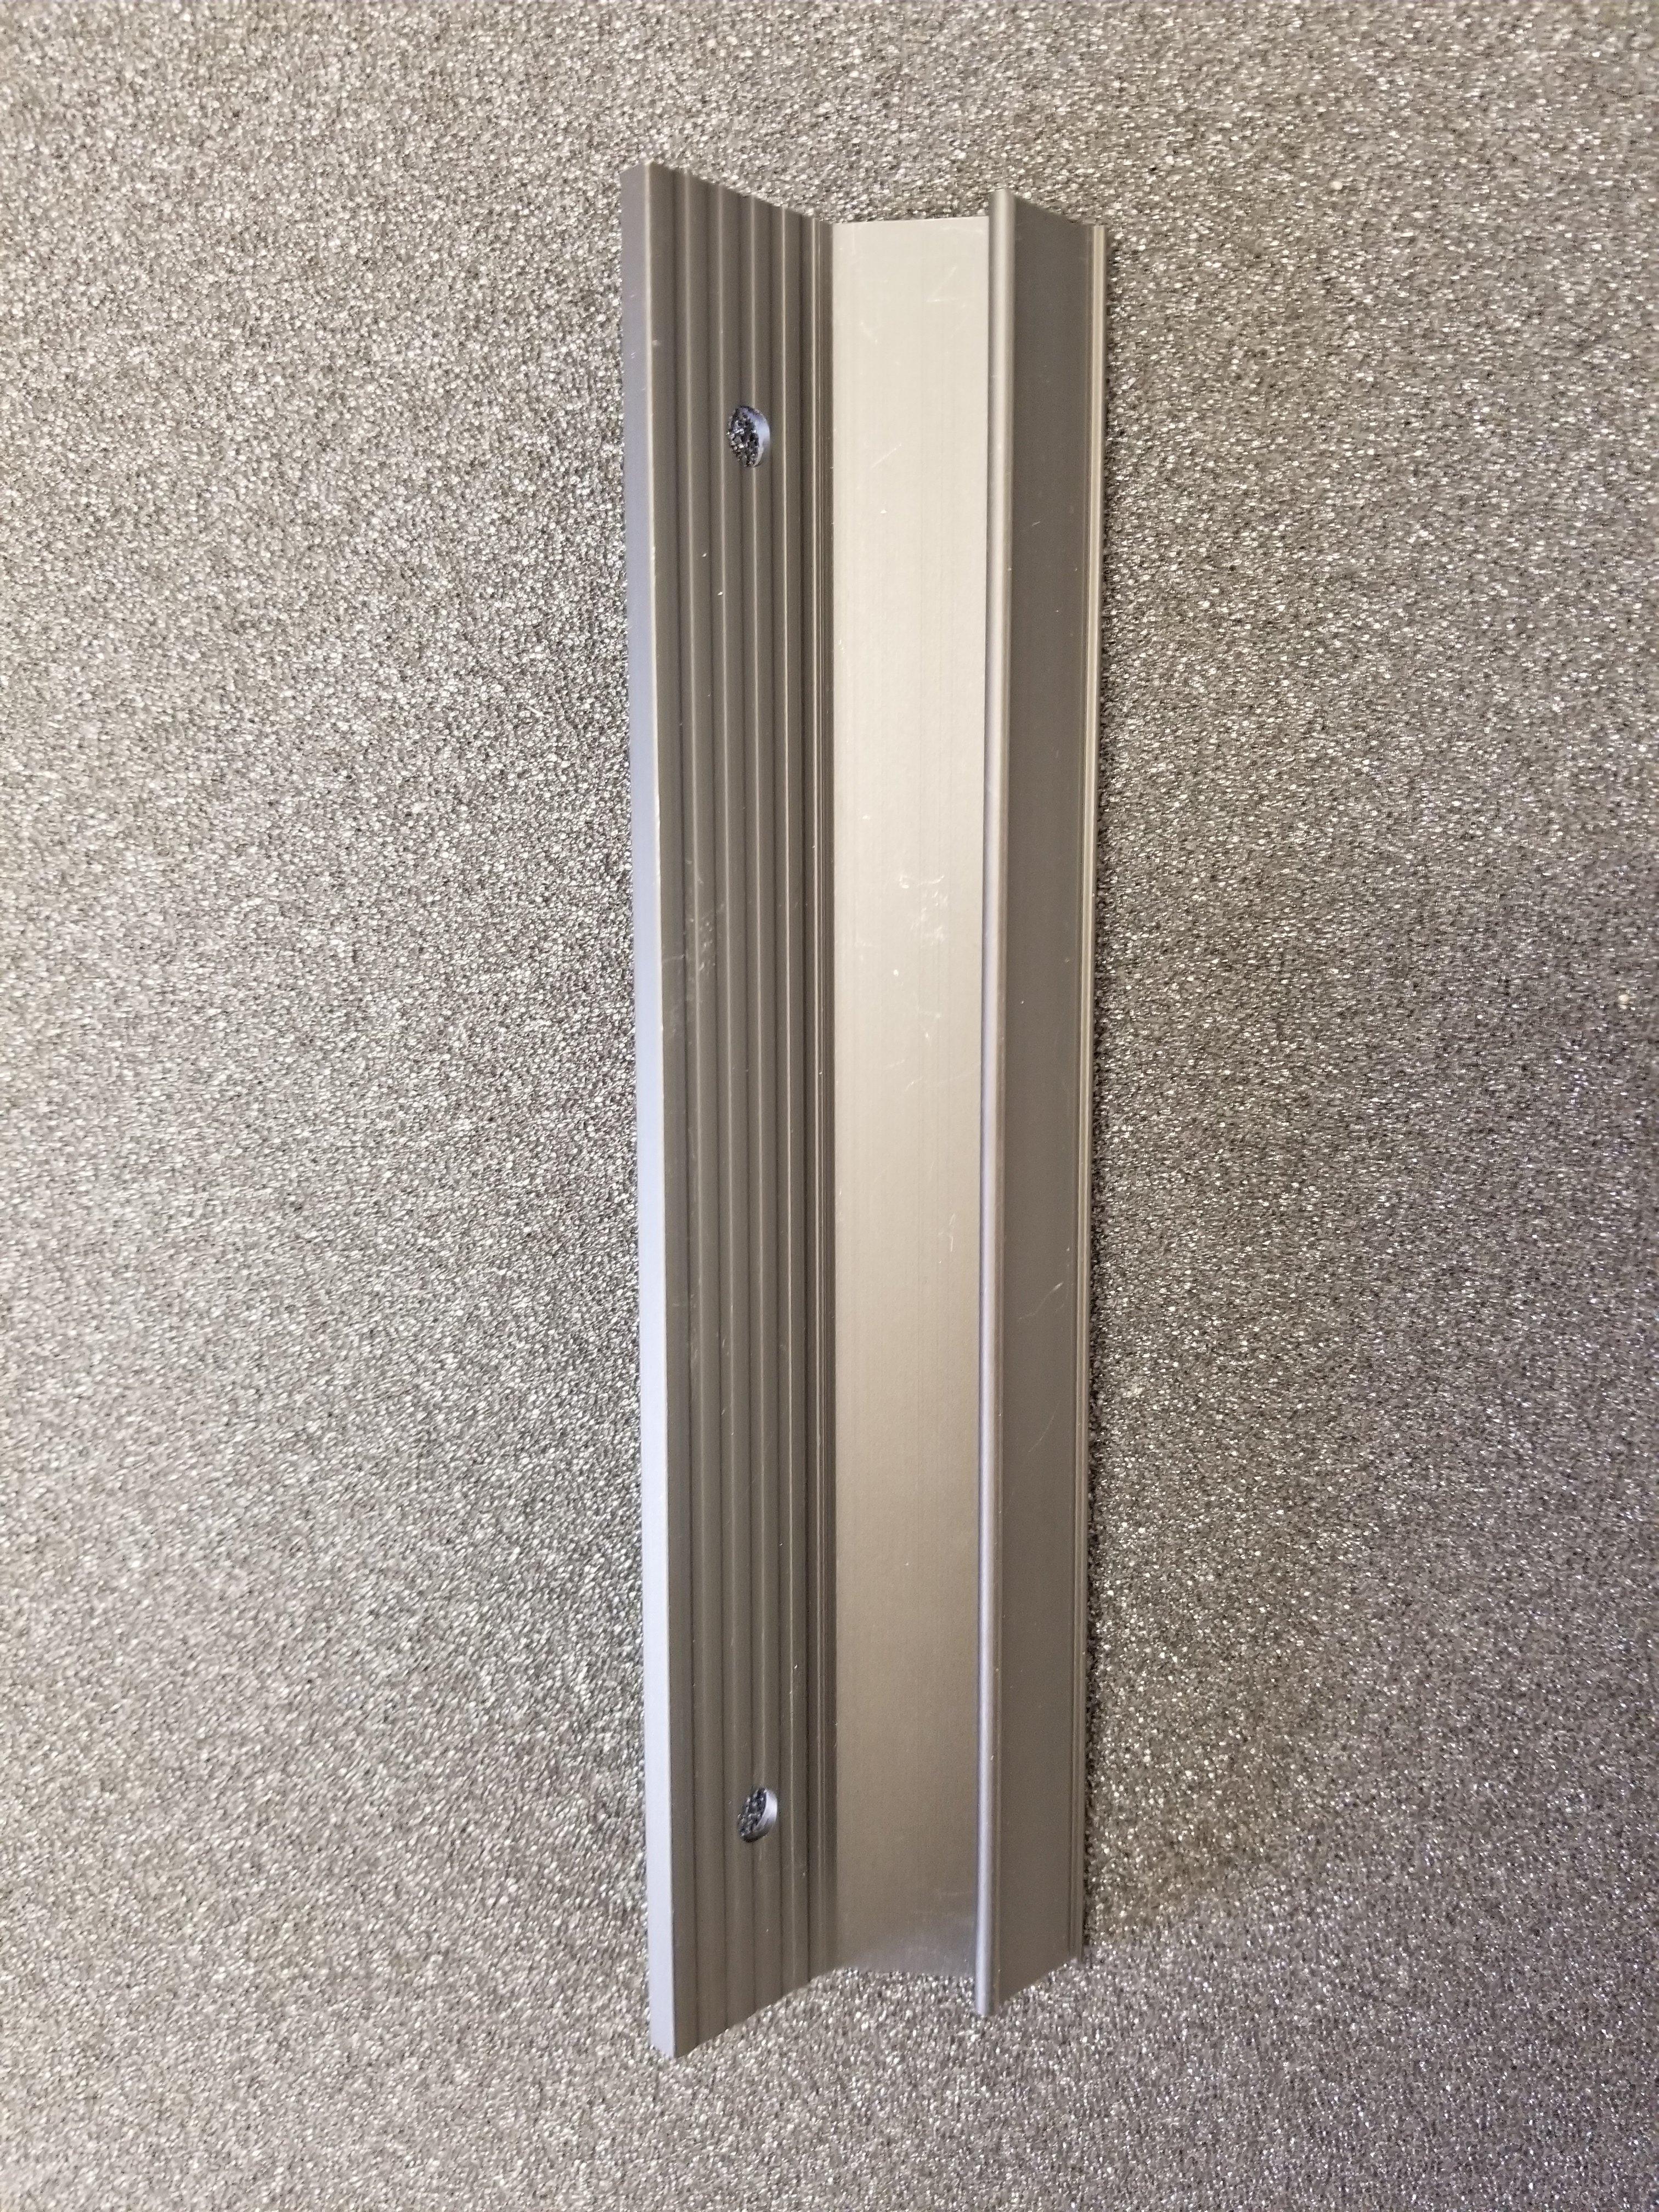 524 001 Adams Rite Sliding Patio Door Exterior Handle 5 1 2 Hurd Sliding Patio Doors Patio Doors Patio